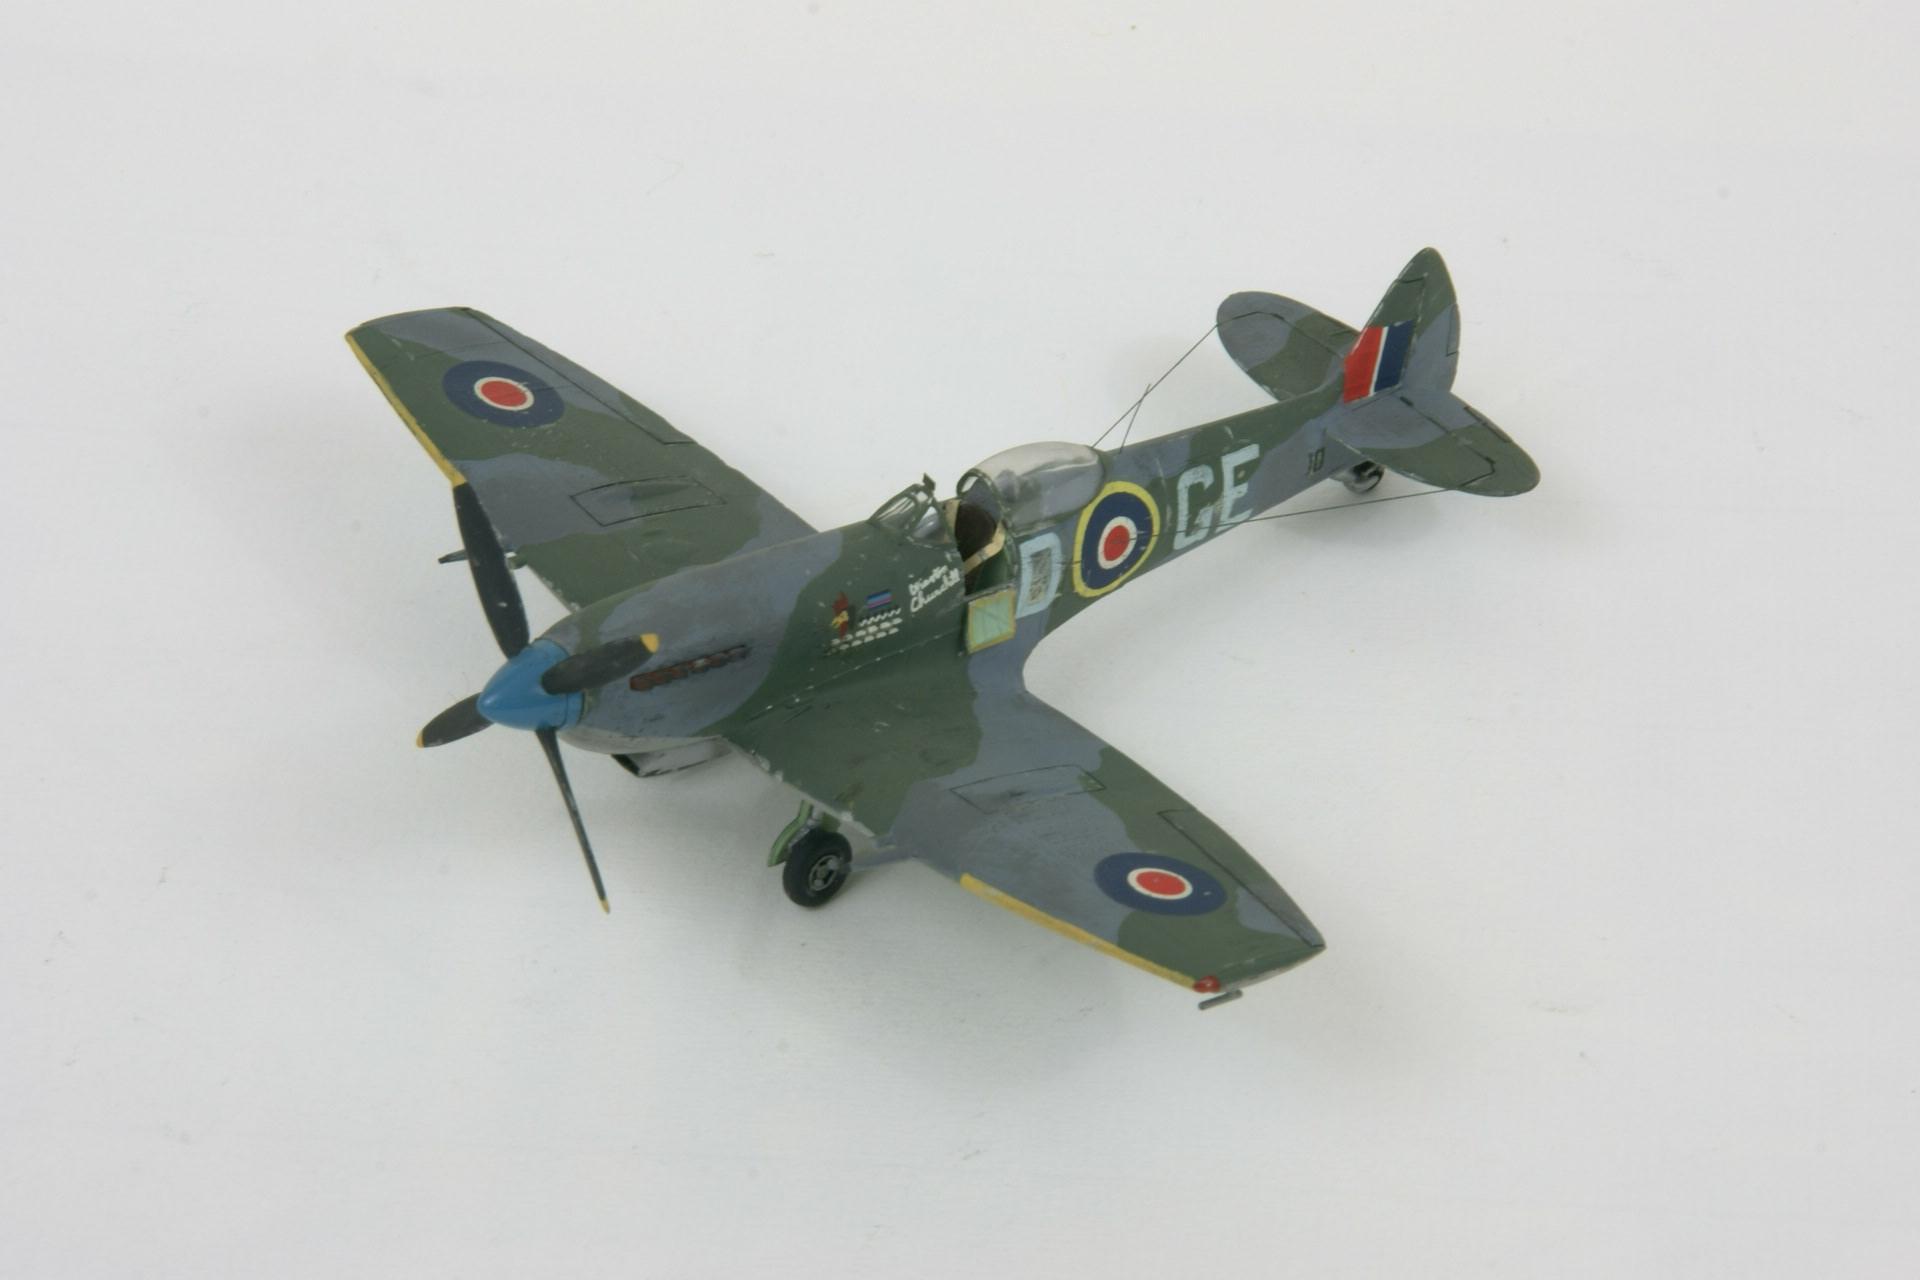 Supermarine spitfire lf xvie late 5